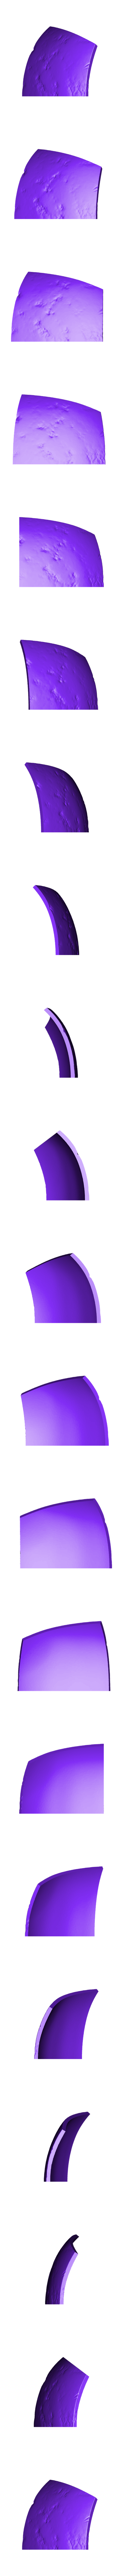 Armory_Damaged_Print15.stl Download OBJ file Armory - Knights of Ren Helmet (damaged), 3D print model • 3D print design, 3D-mon